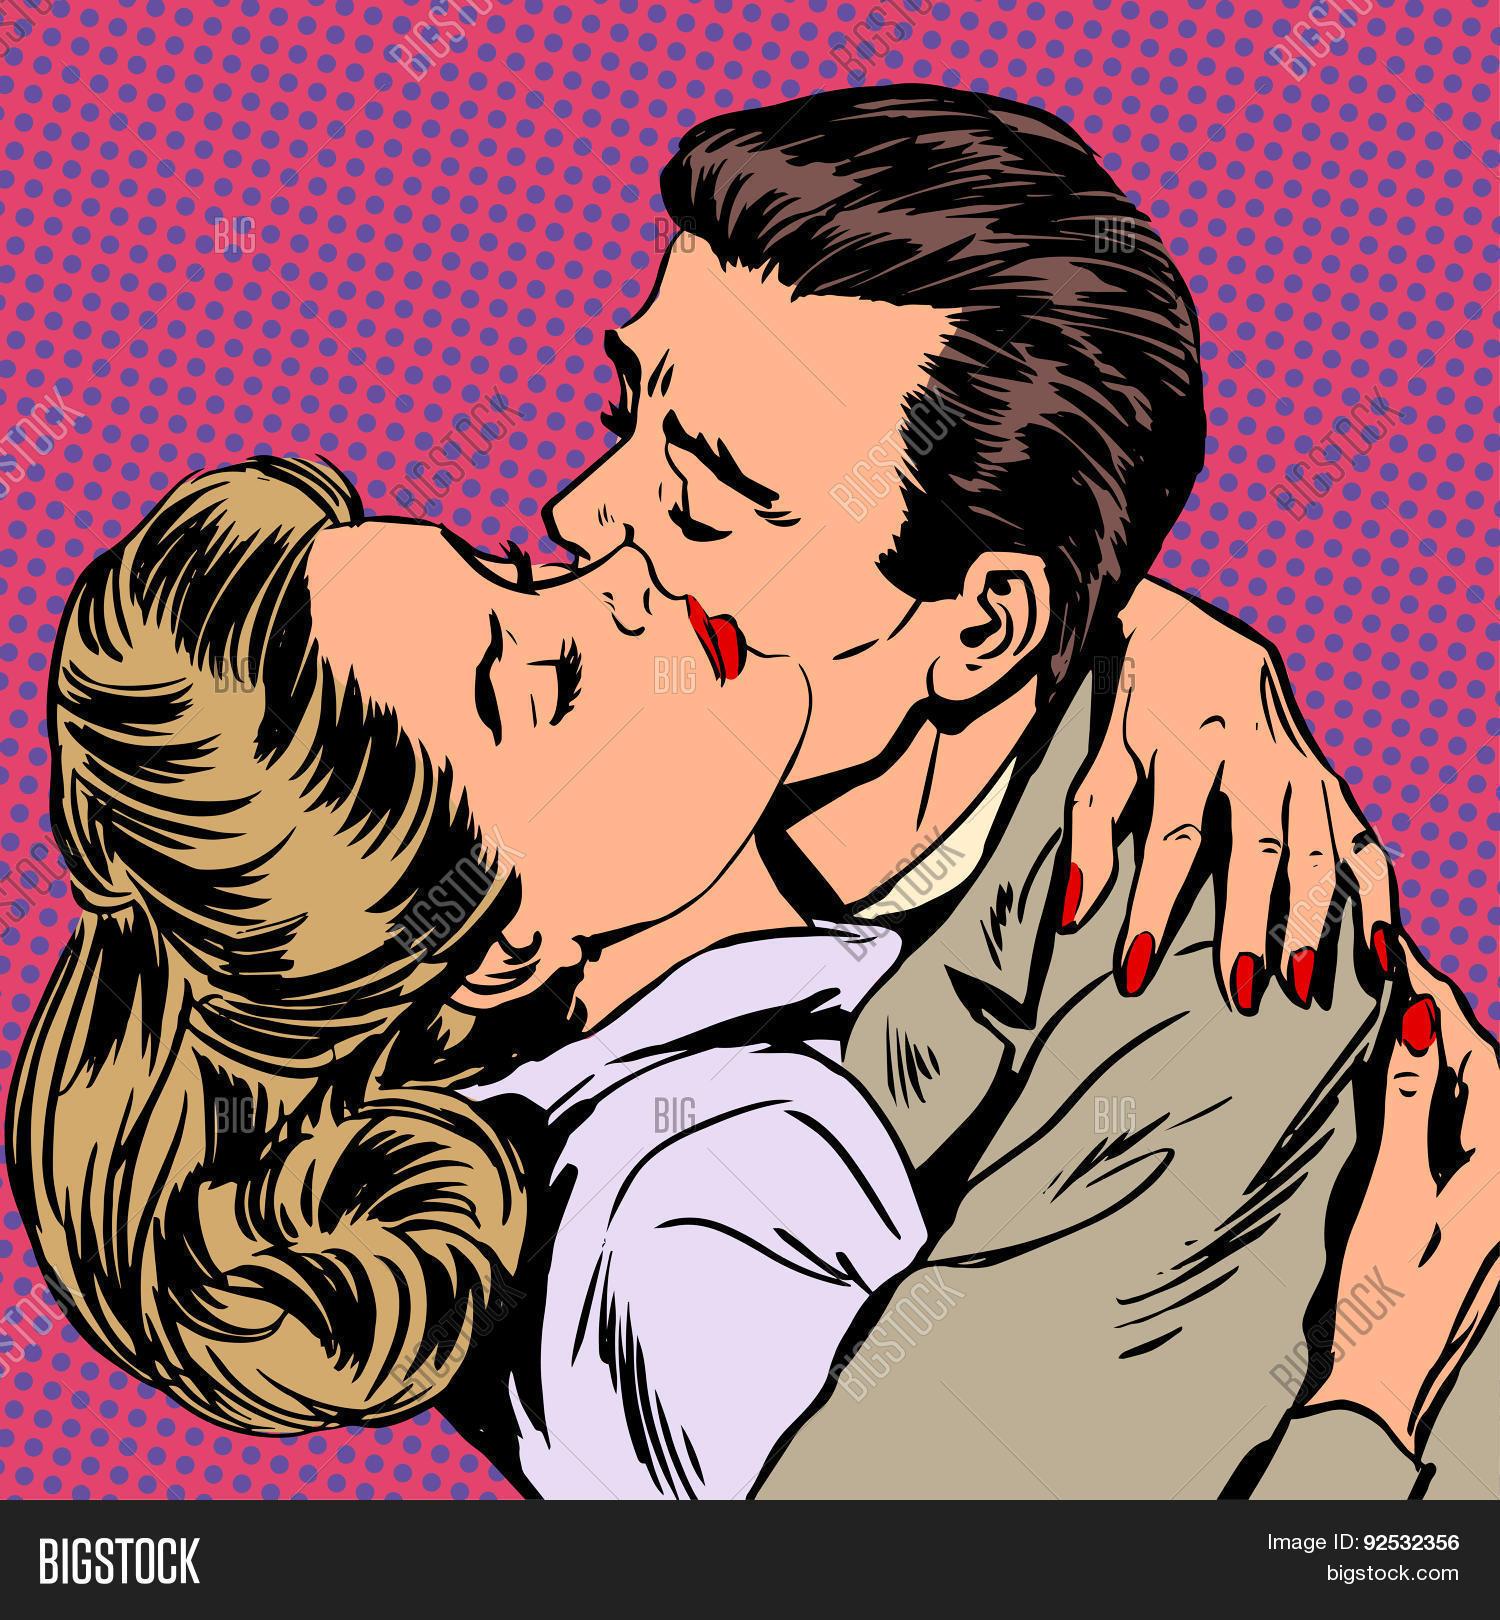 Passion man woman embrace love relationship Halftone style pop art retro  vintage